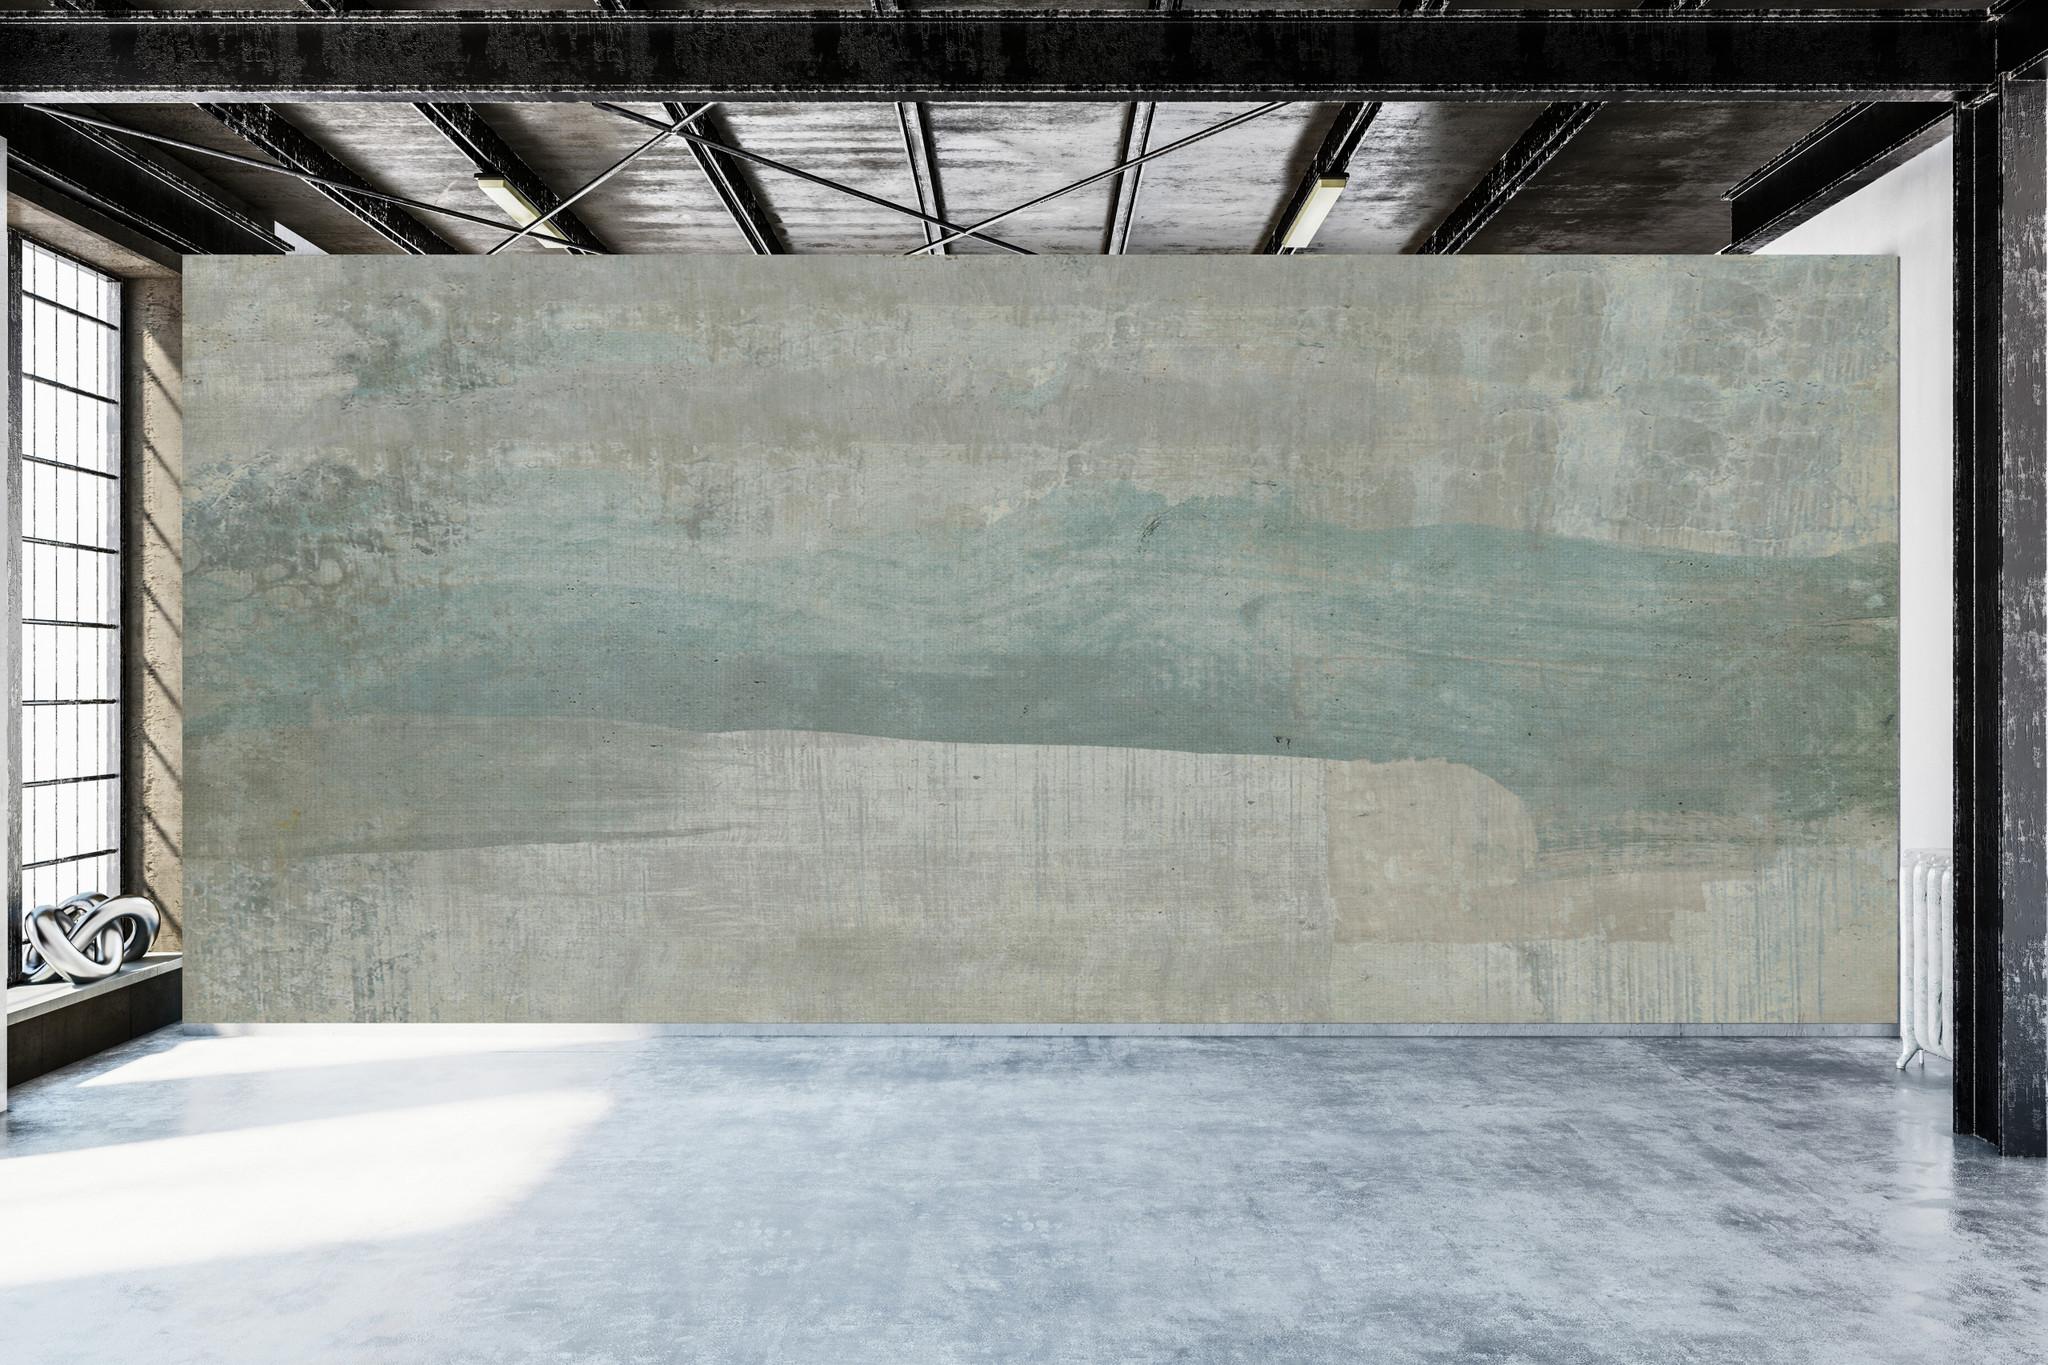 Wallpaper - Abstract Landscape - Lakes Edge